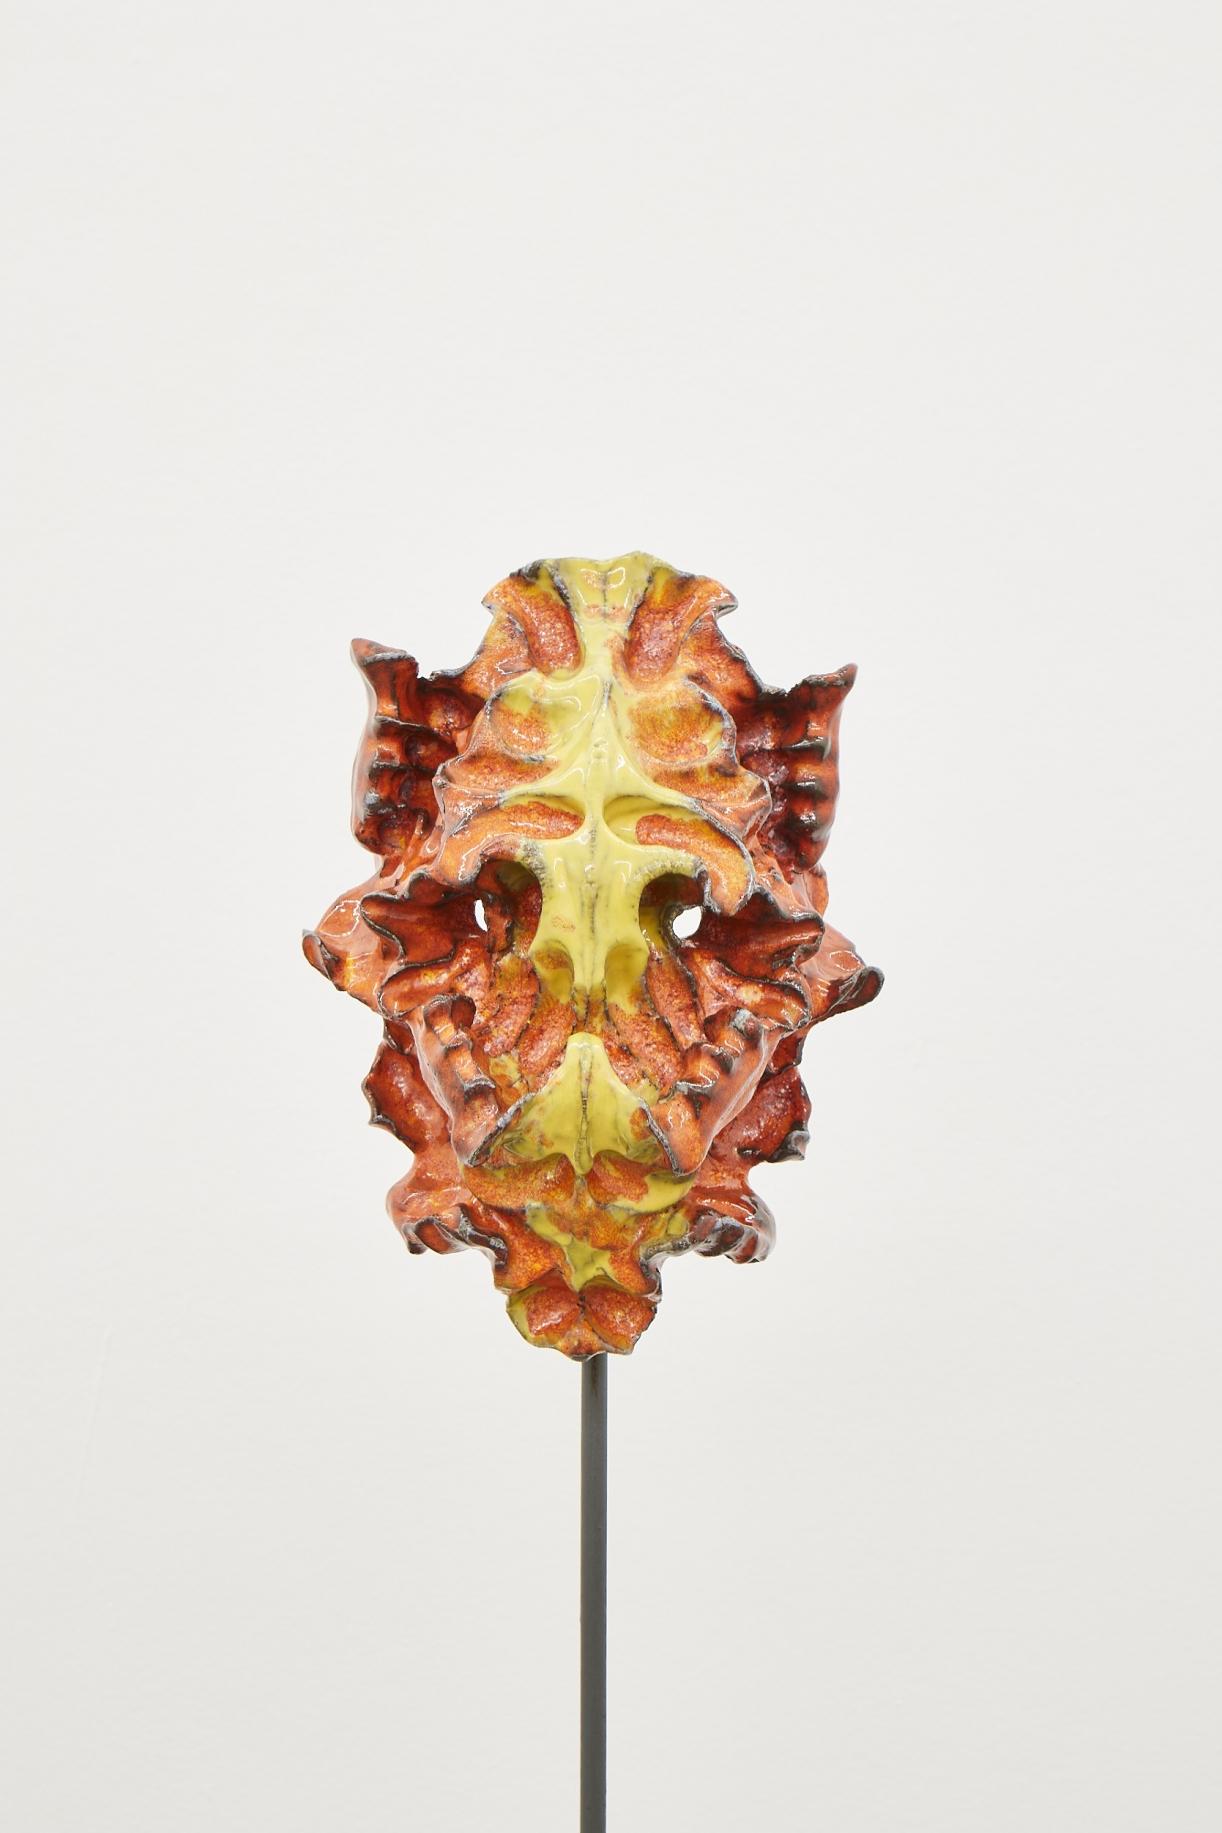 Moritz Altmann, kav, 2017, glazed ceramic, 26 x 37 x 17 cm